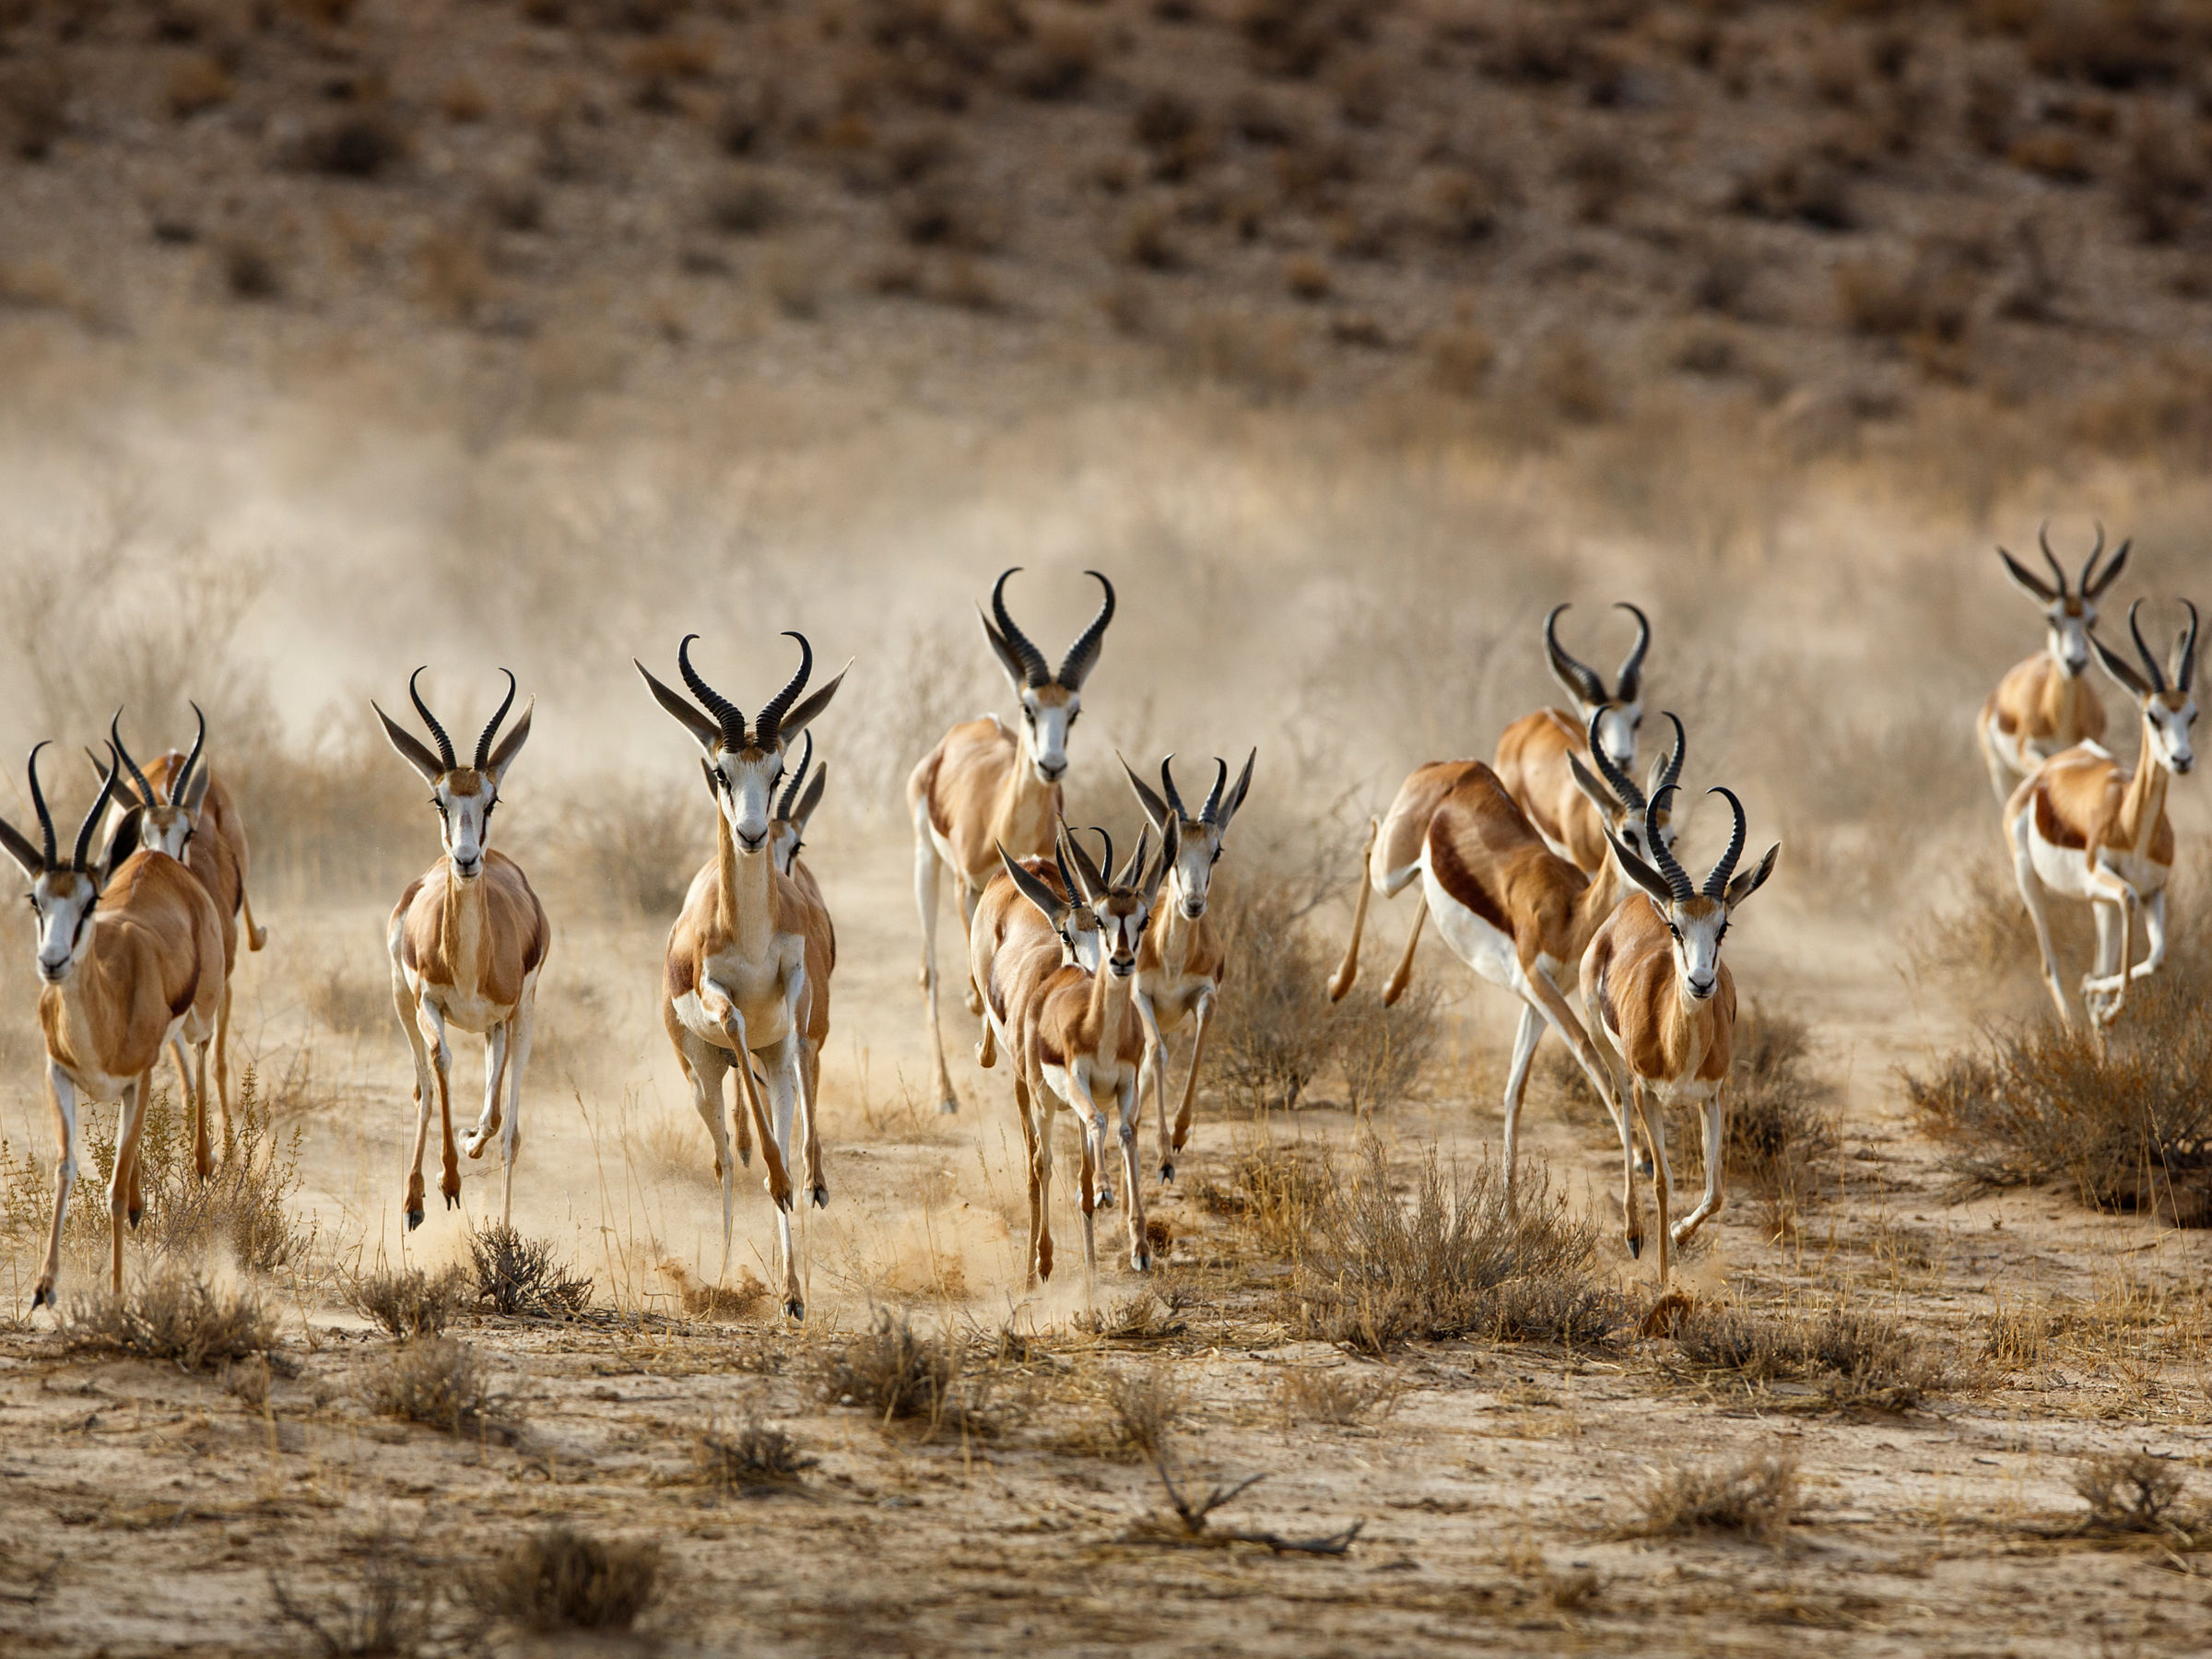 Springbok (Antidorcas marsupialis) herd running from cheetah, Kgalagadi Transfrontier Park, Northern Cape Province, South Africa, December.